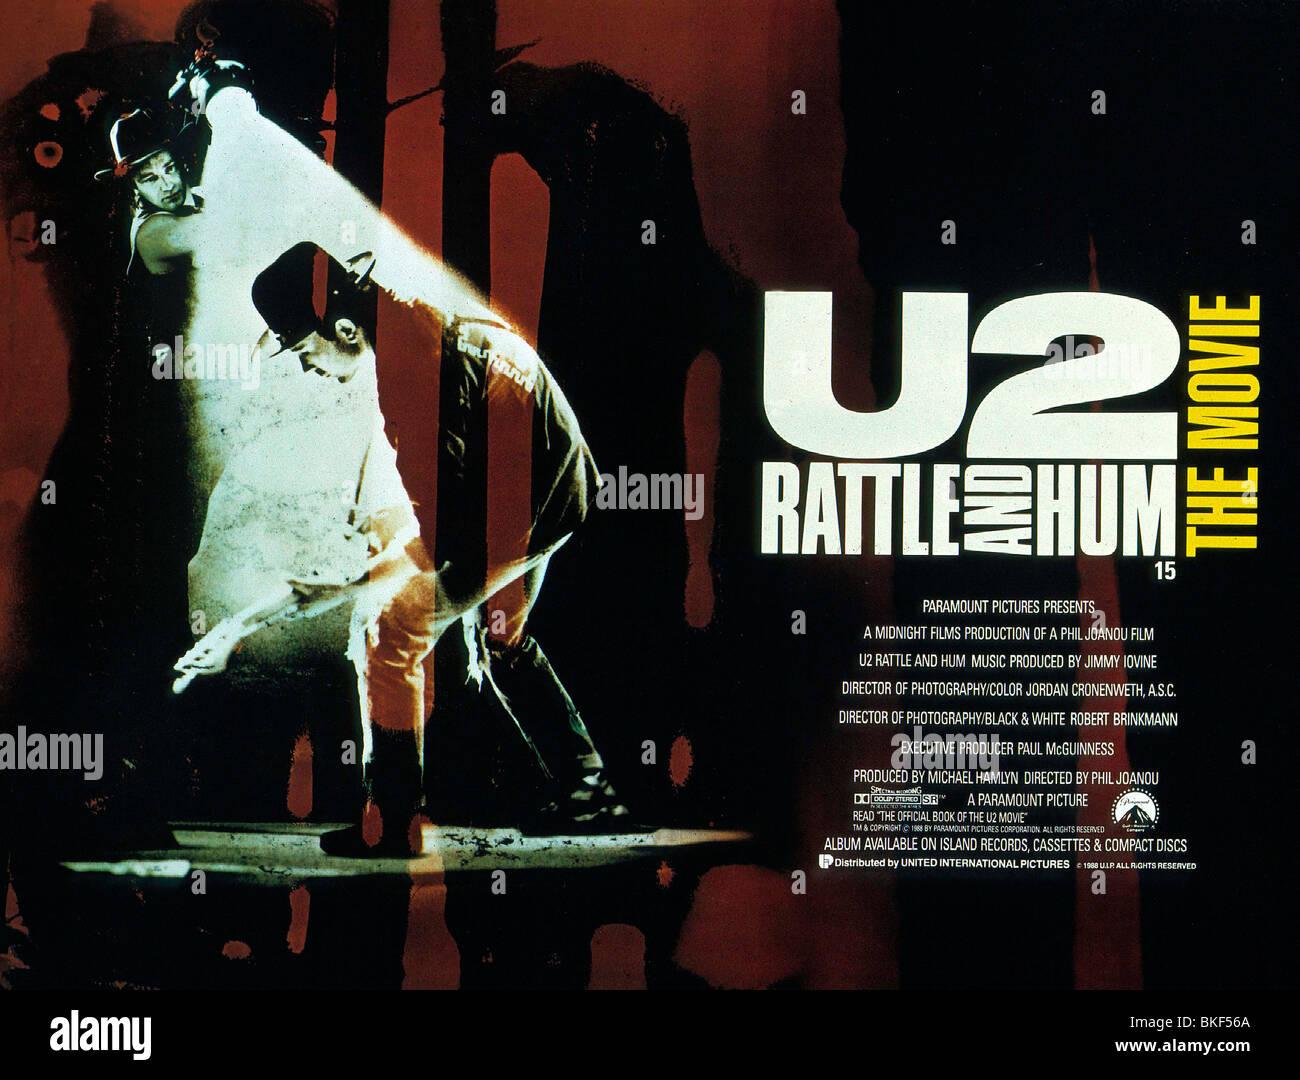 U2 : RATTLE AND HUM (1988) BONO, THE EDGE POSTER U2R 006 - Stock Image